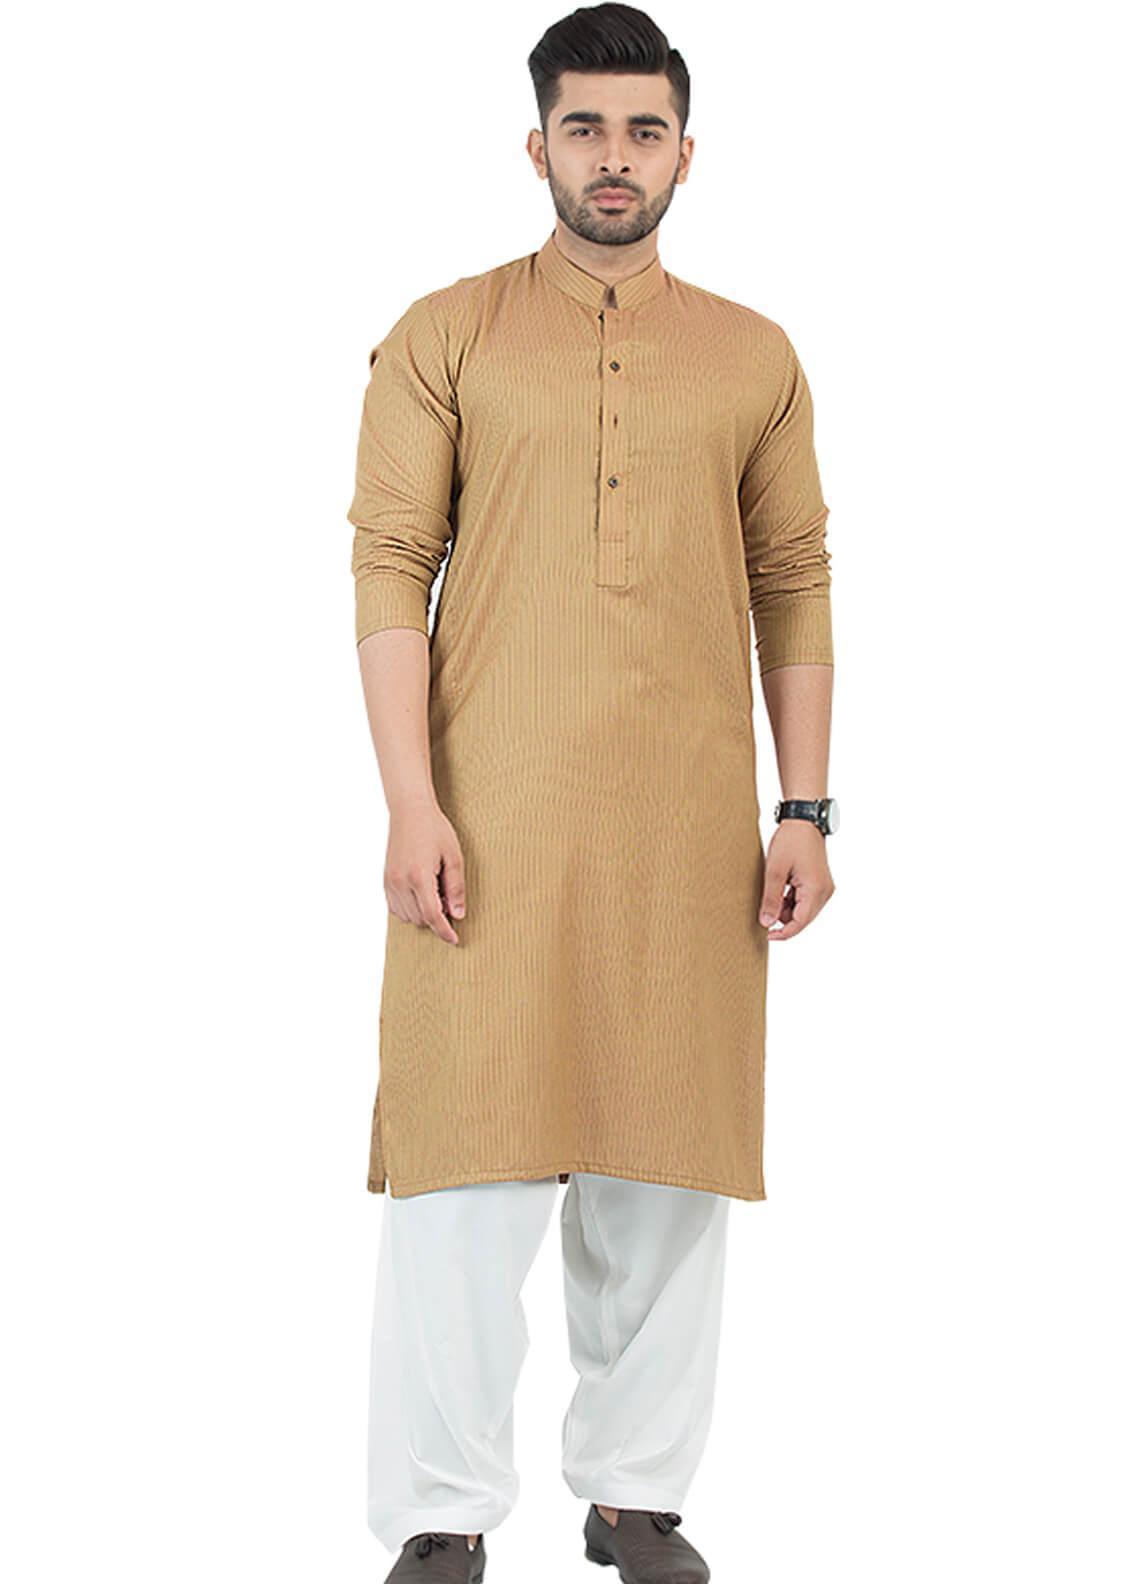 Shahzeb Saeed Wash N Wear Formal Men Kurta - Mustard KURTA-86